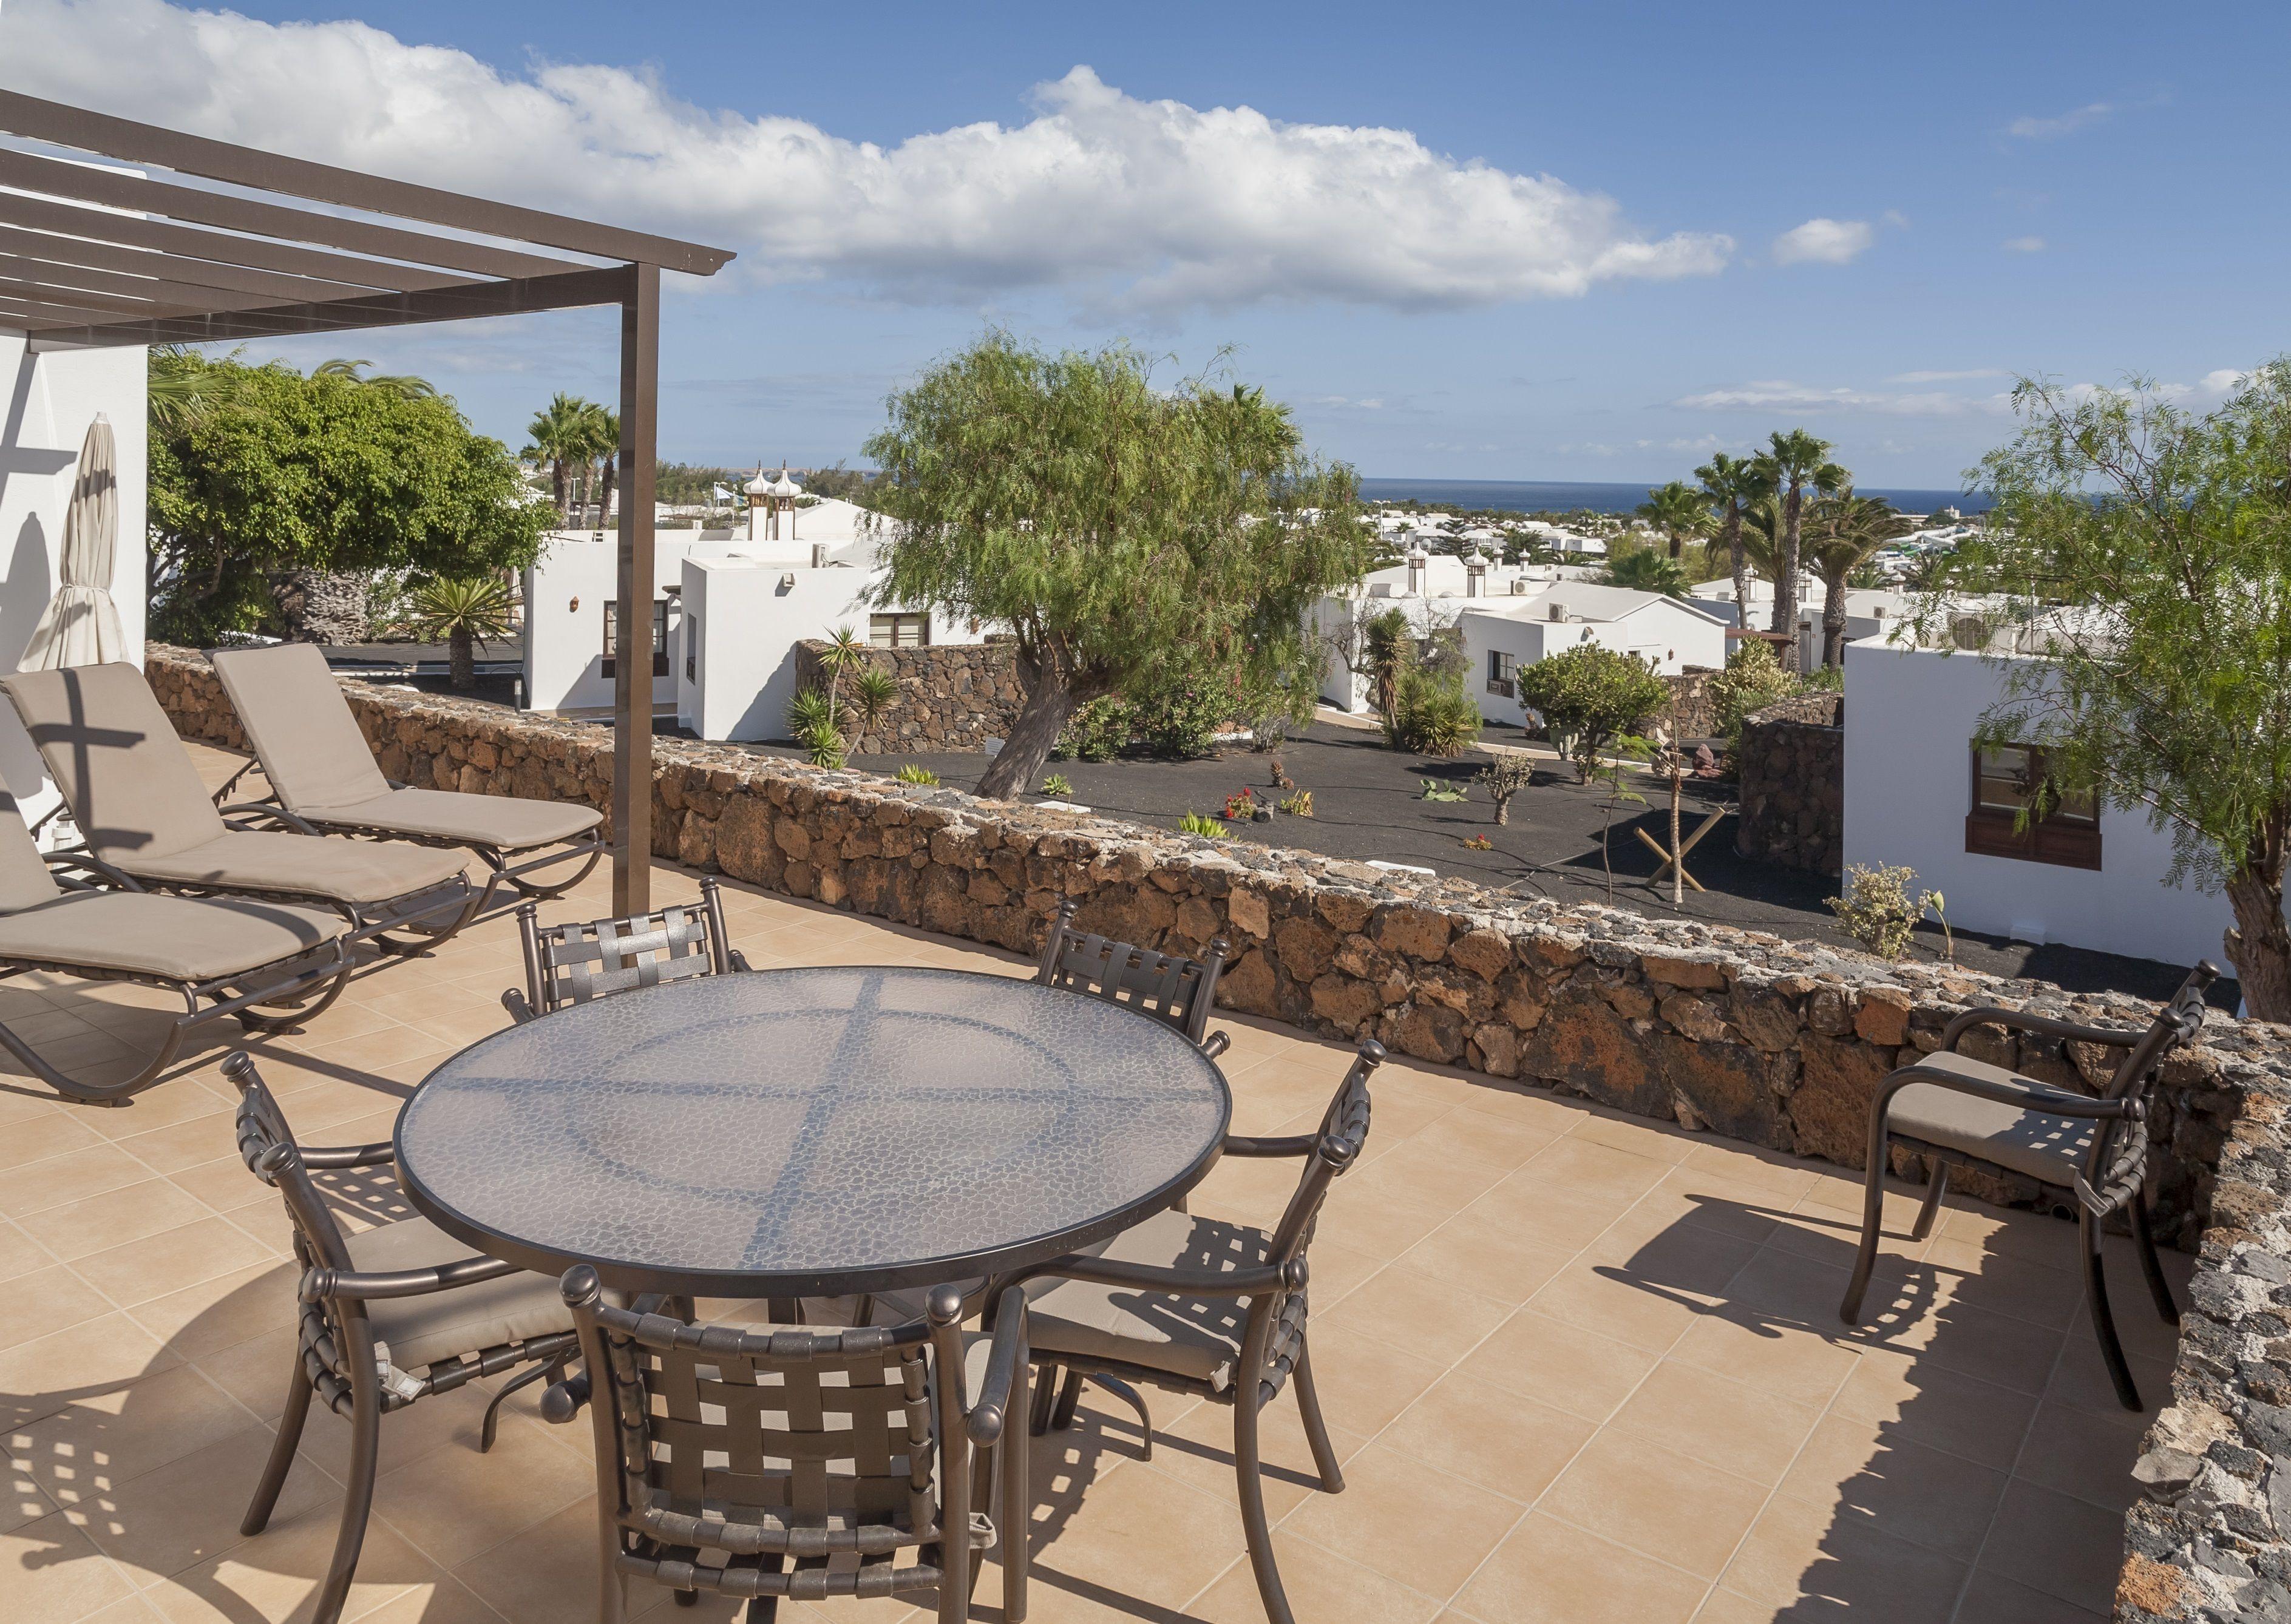 Courtesy of Jardines del Sol by Diamond Resorts / Expedia